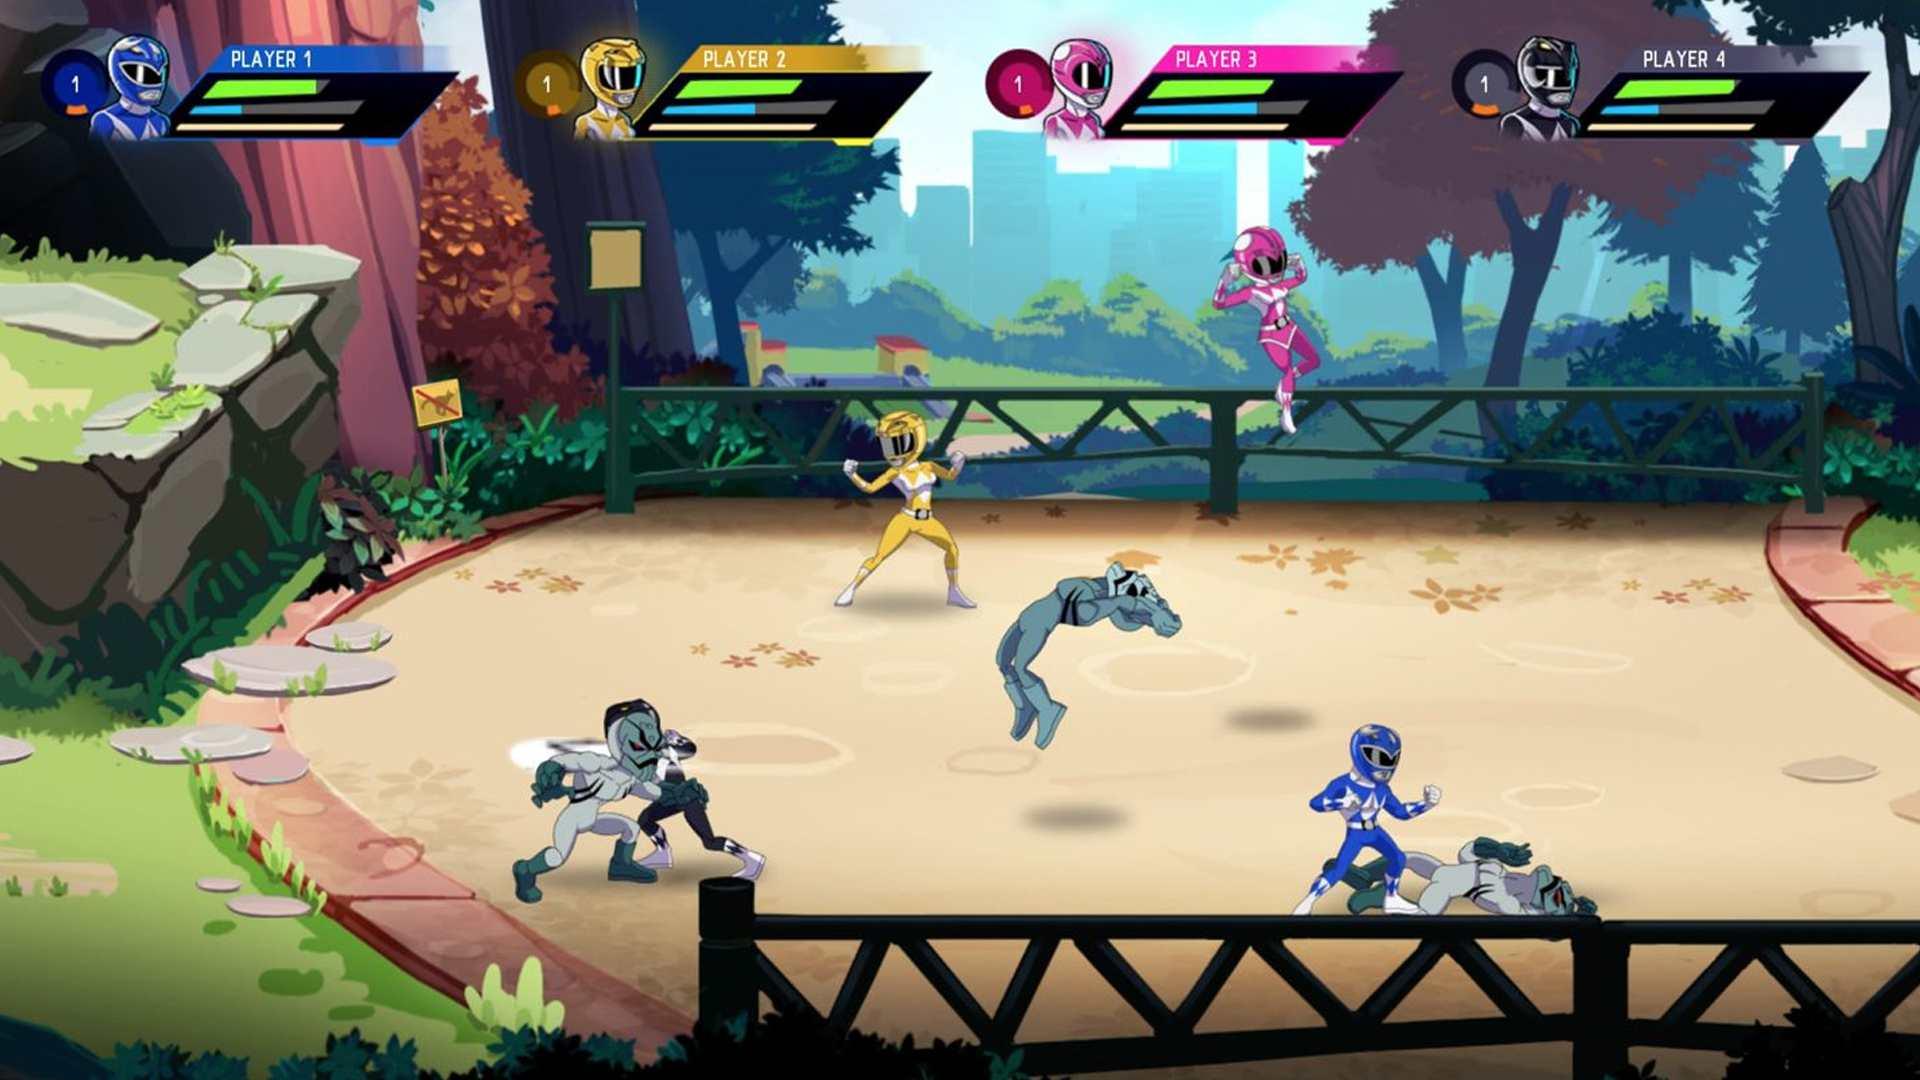 Saban's Mighty Morphin Power Rangers: Mega Battle offline video game for kids.